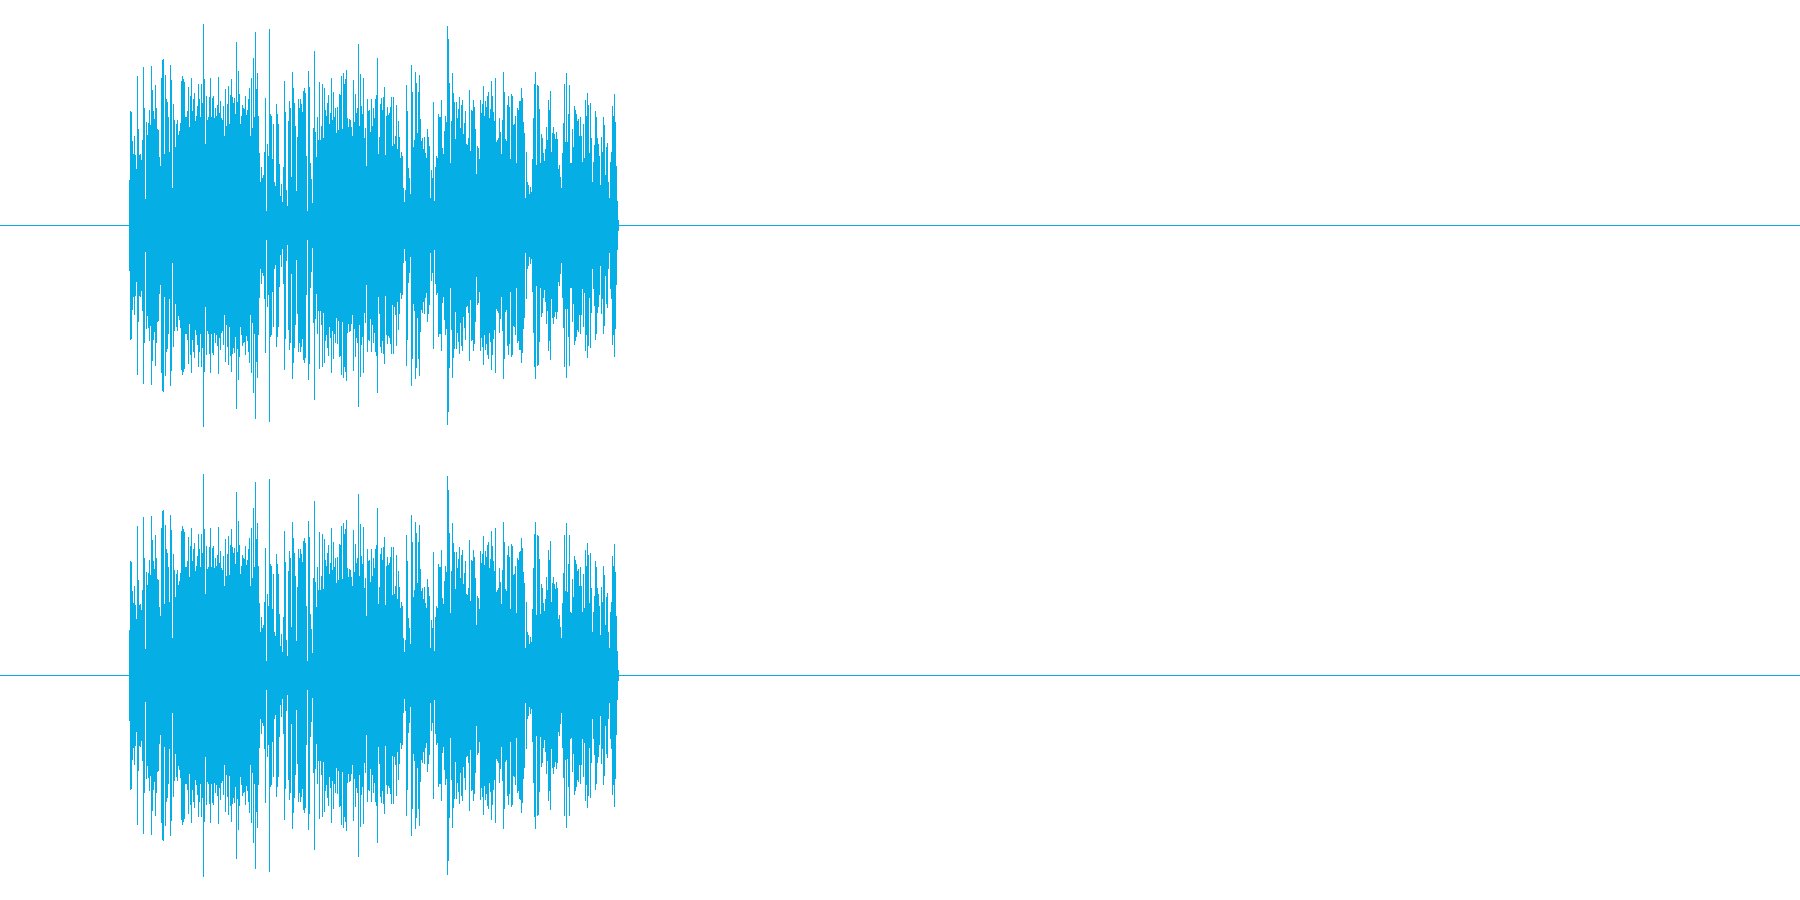 【NES RPG03-02(攻撃)】の再生済みの波形